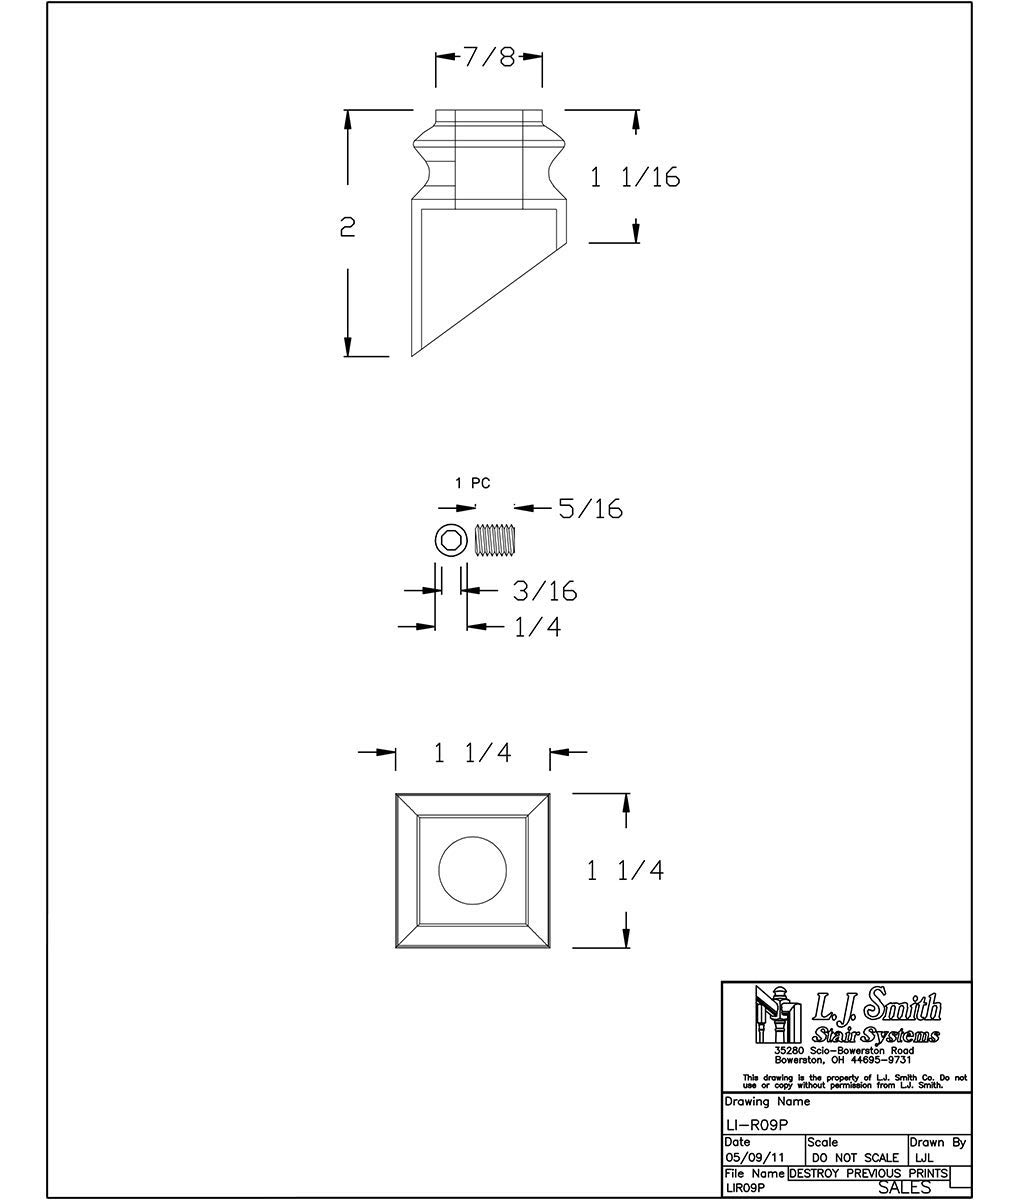 LI-R09P: 1/2'' Round Angled Iron Shoe - Set Screw Included (Matte Black)